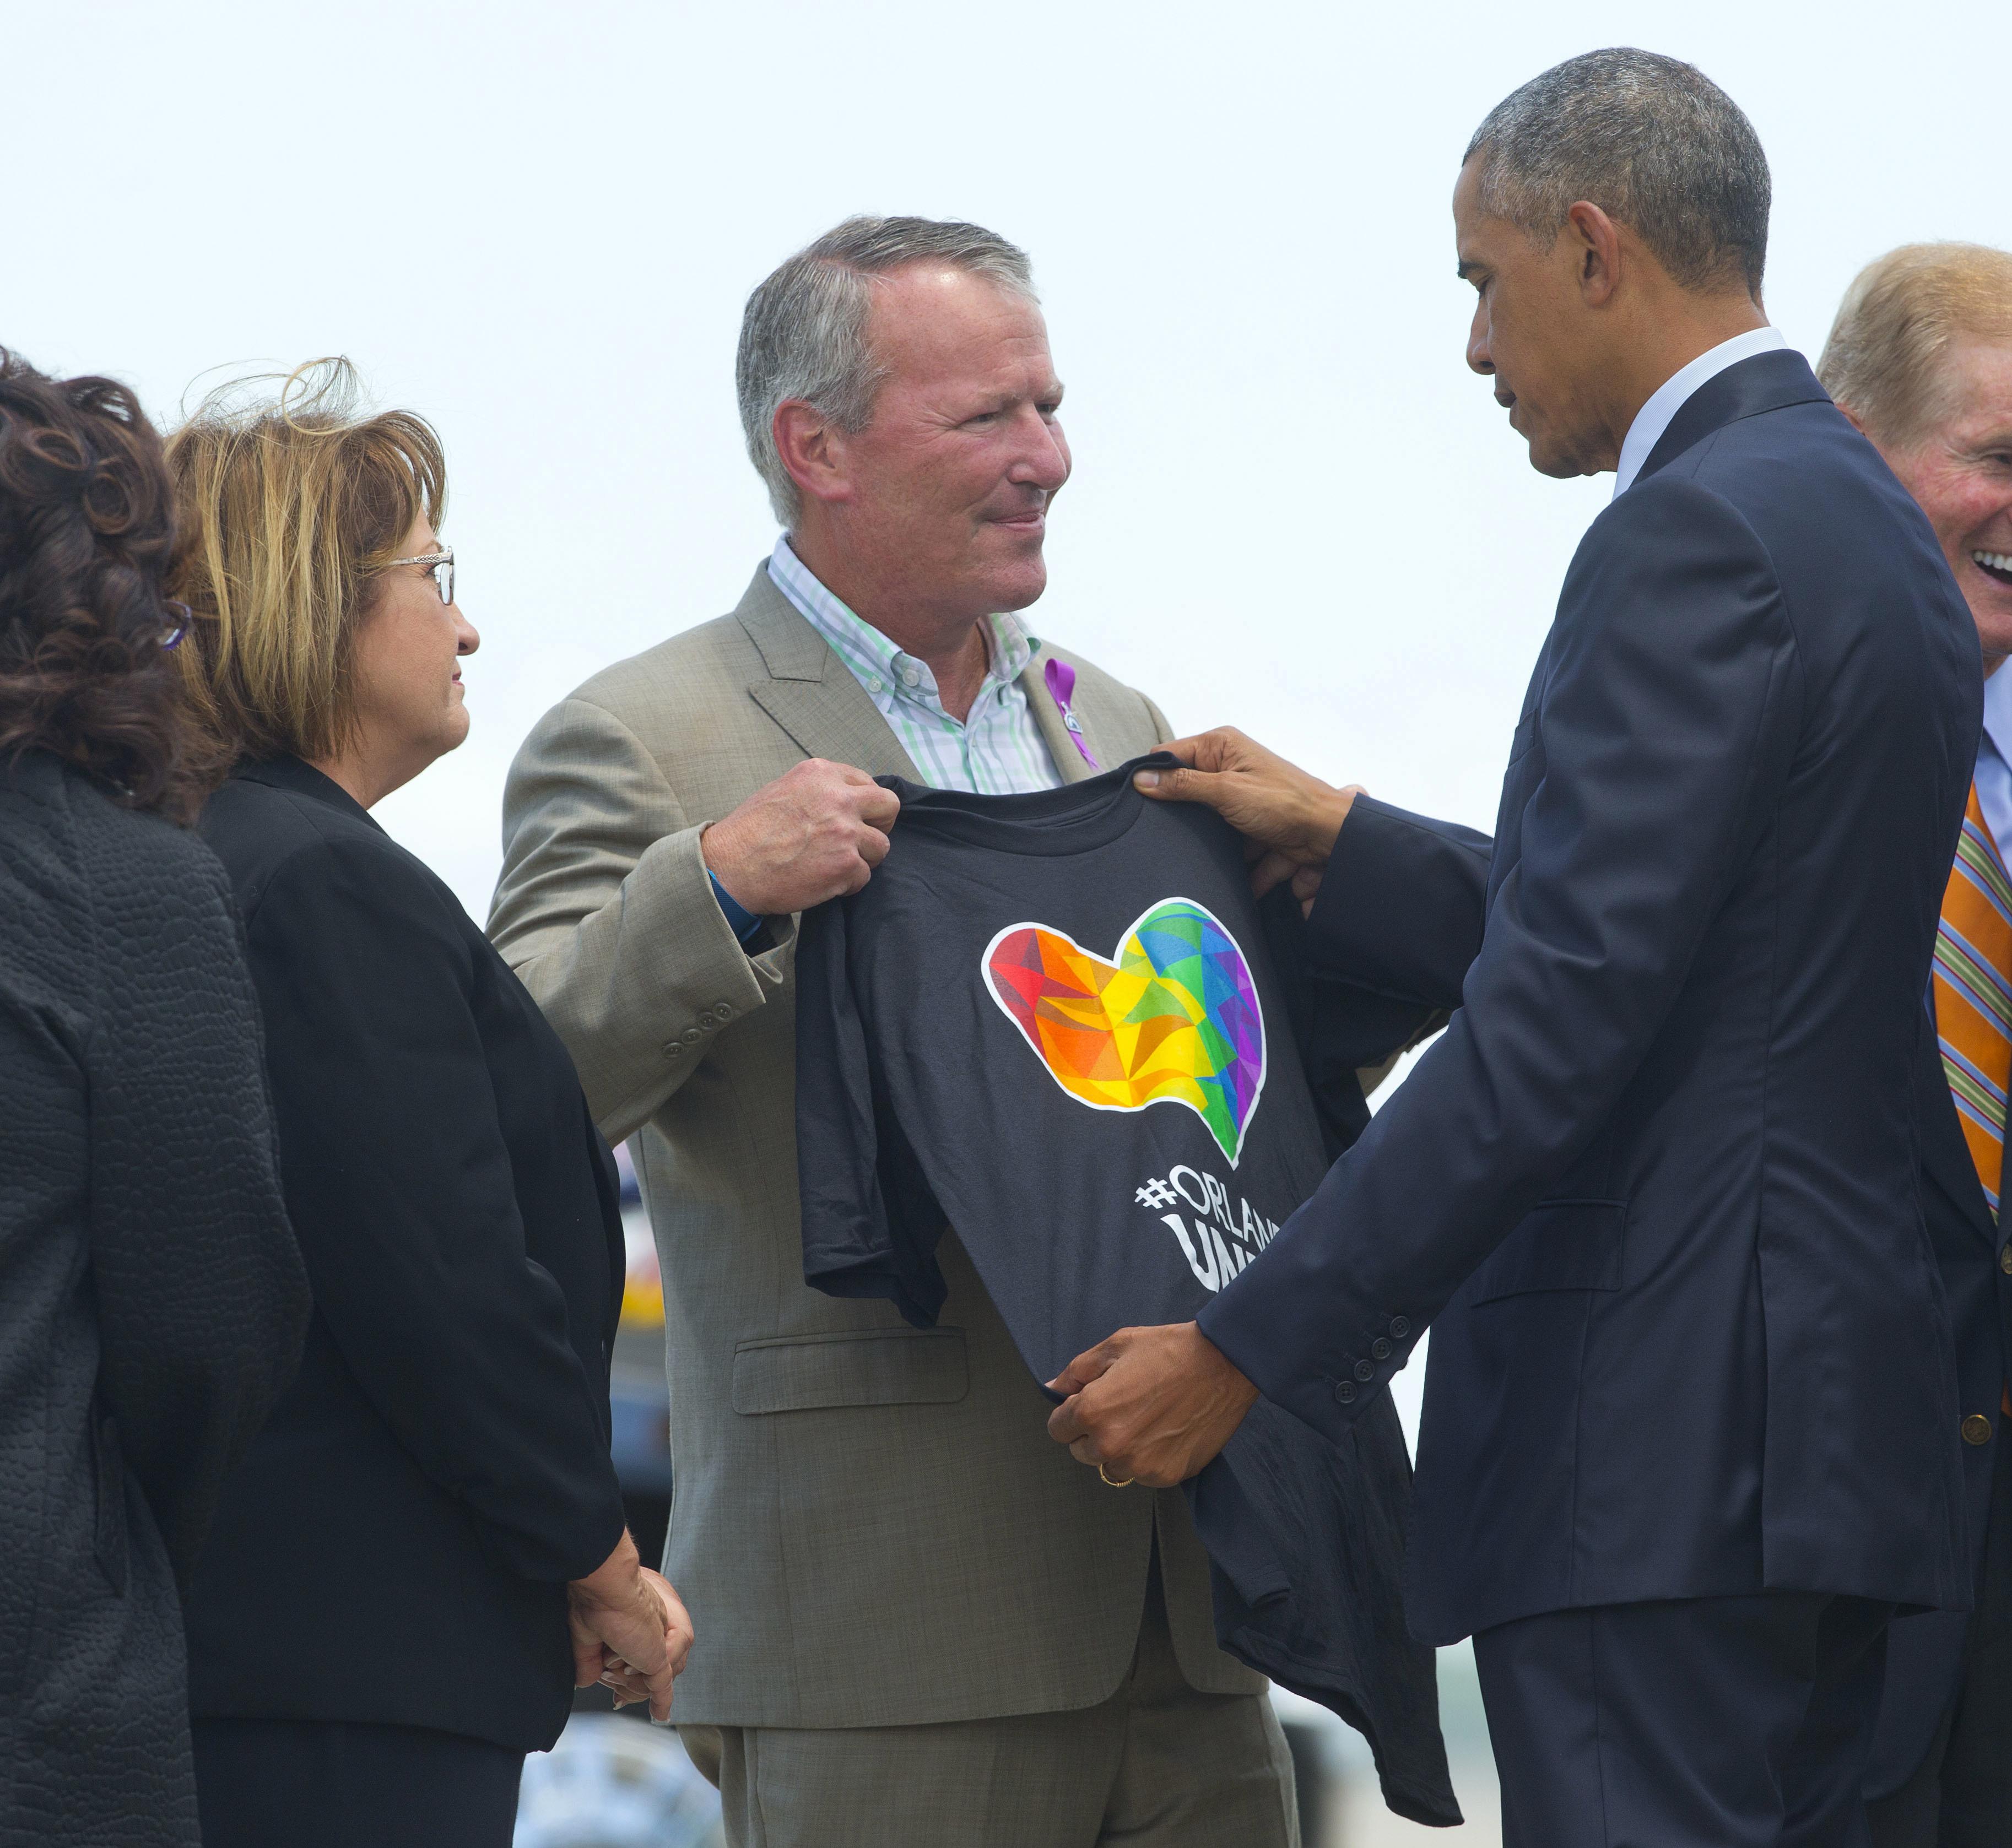 Orlando Nightclub Shooting Bodies: In Orlando, Obama Calls For Healing, Meets